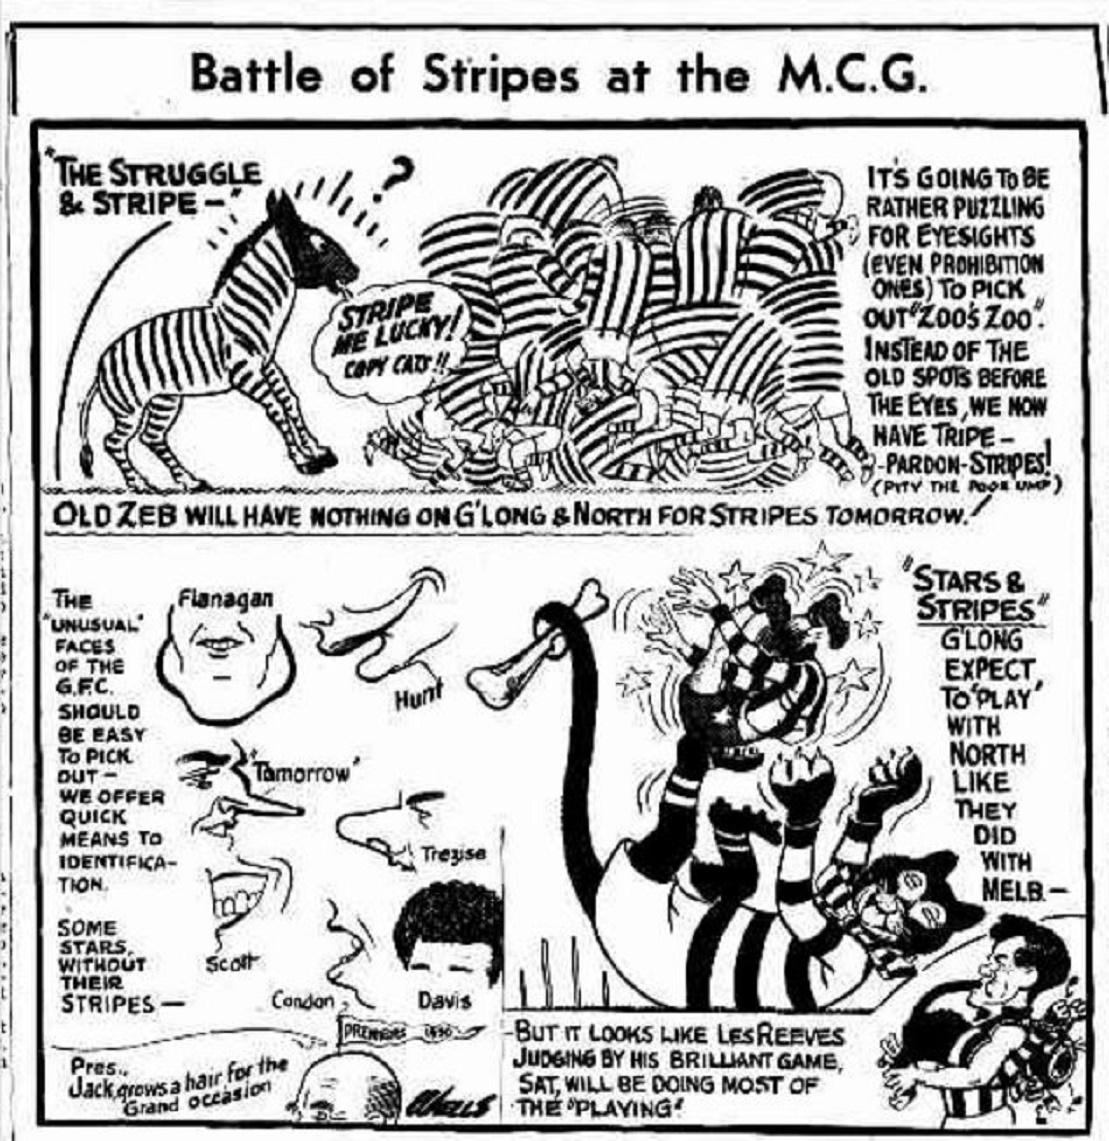 09 15 (Age) Battle of stripes.JPG